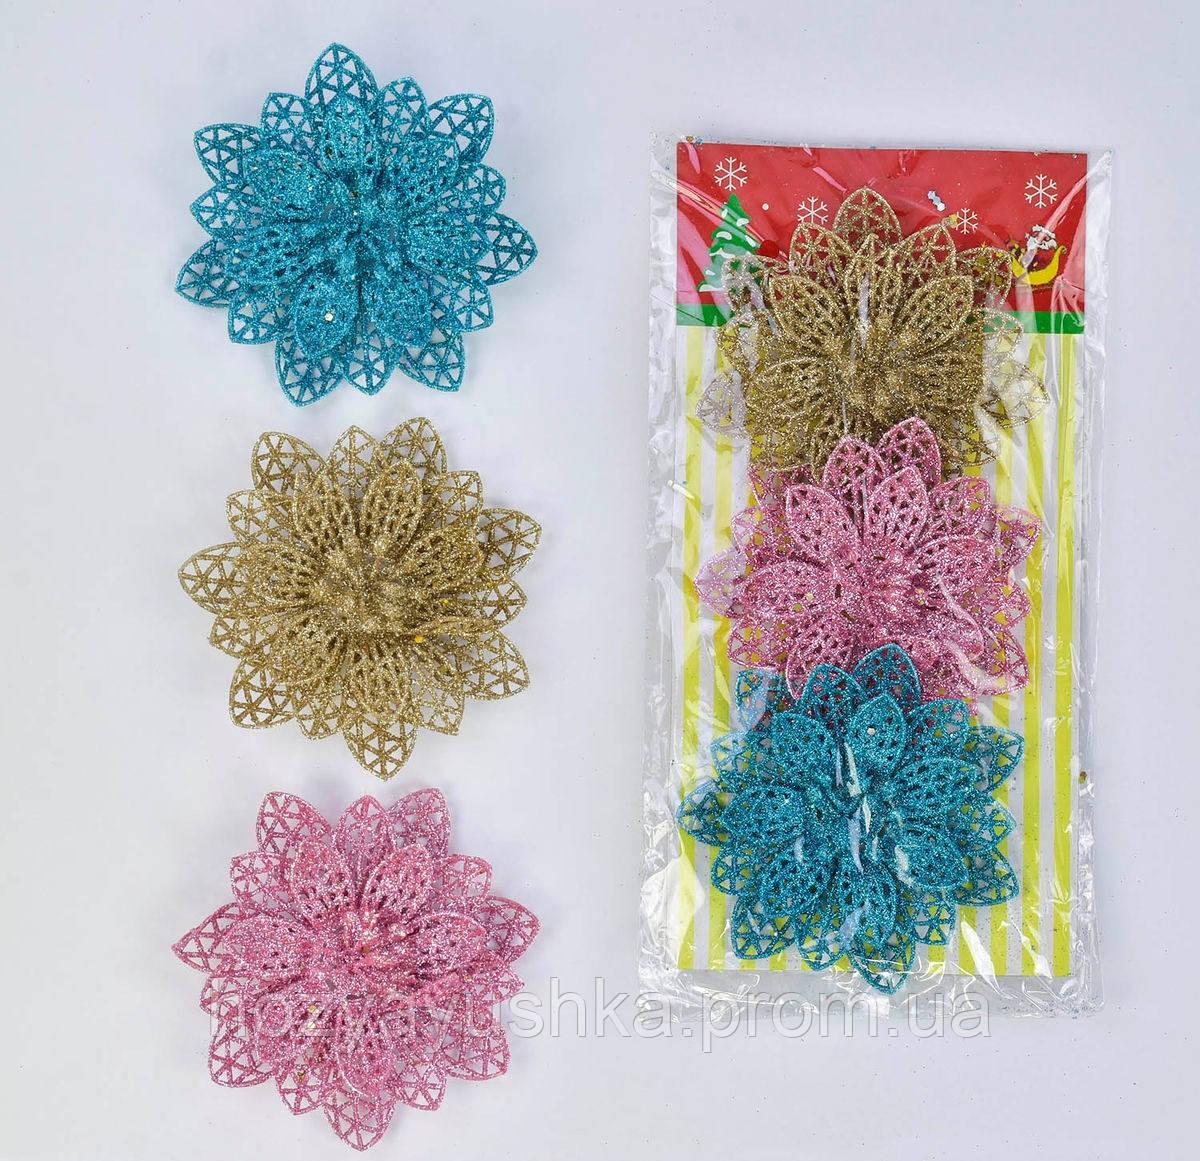 Ёлочная игрушка С 30961 Цветок 3шт на листе